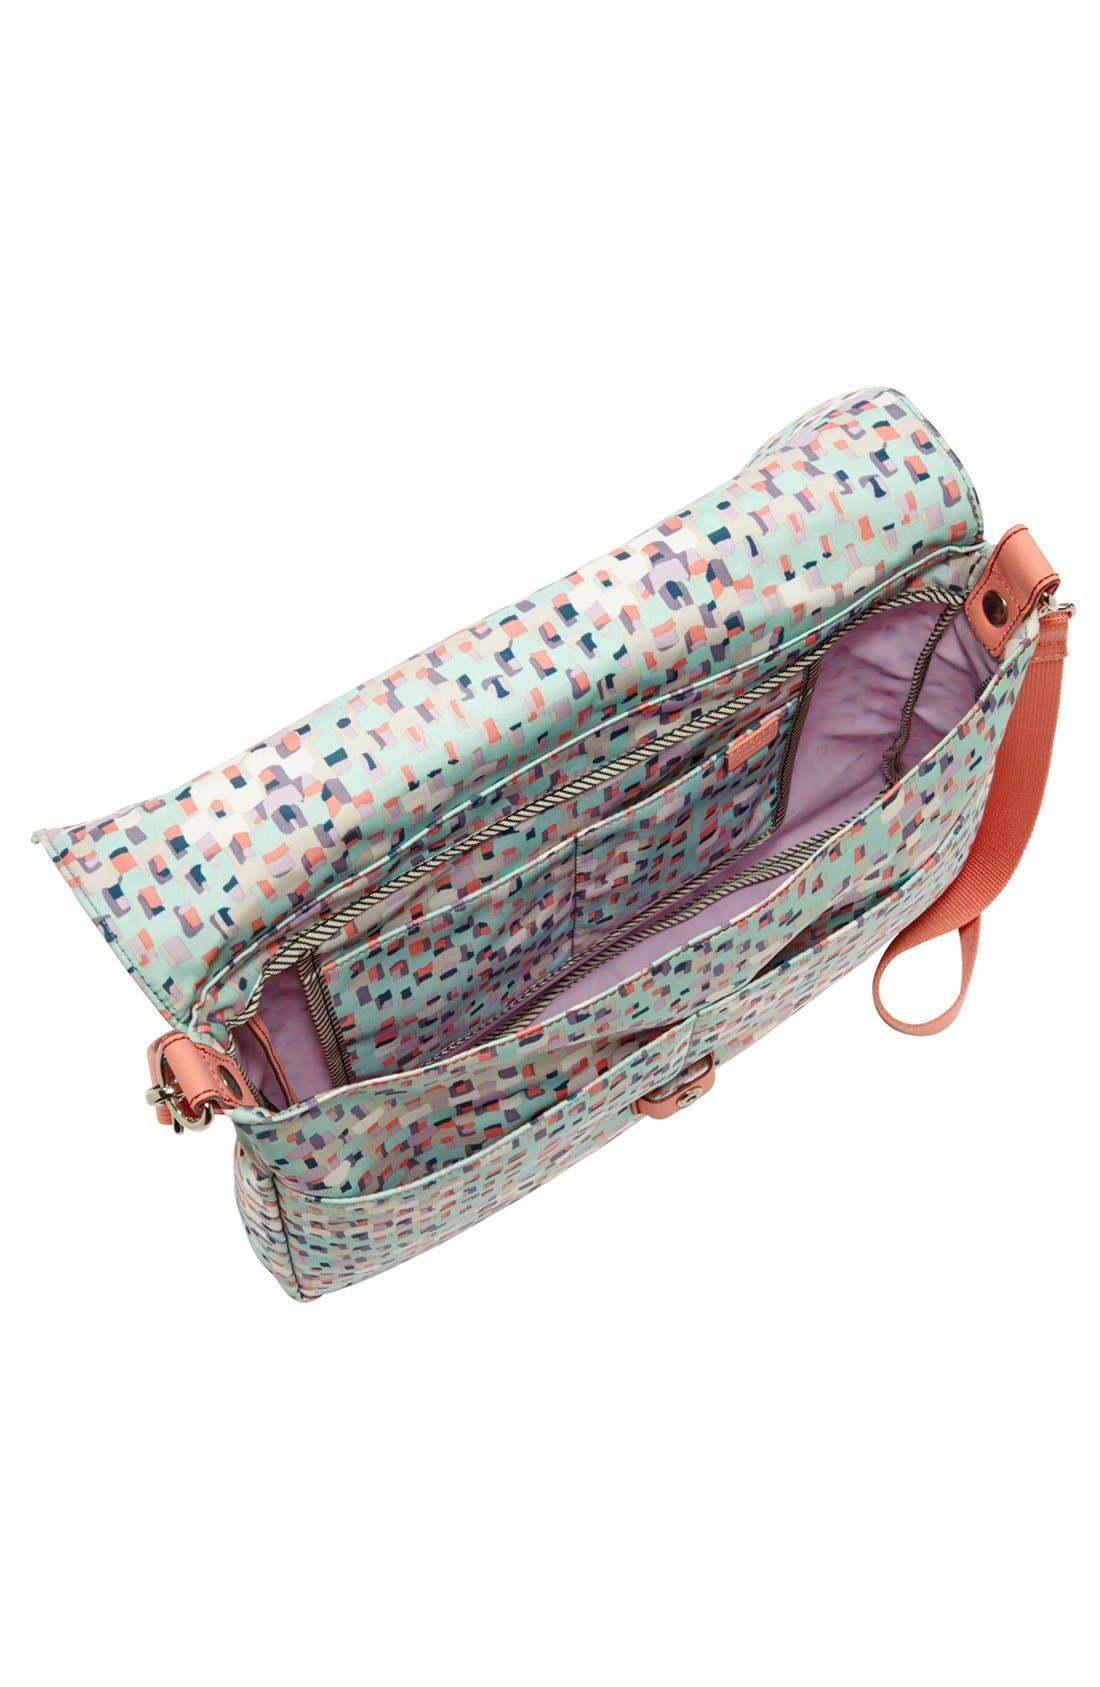 FOSSIL,                             'Key-Per' Messenger Bag,                             Alternate thumbnail 3, color,                             403